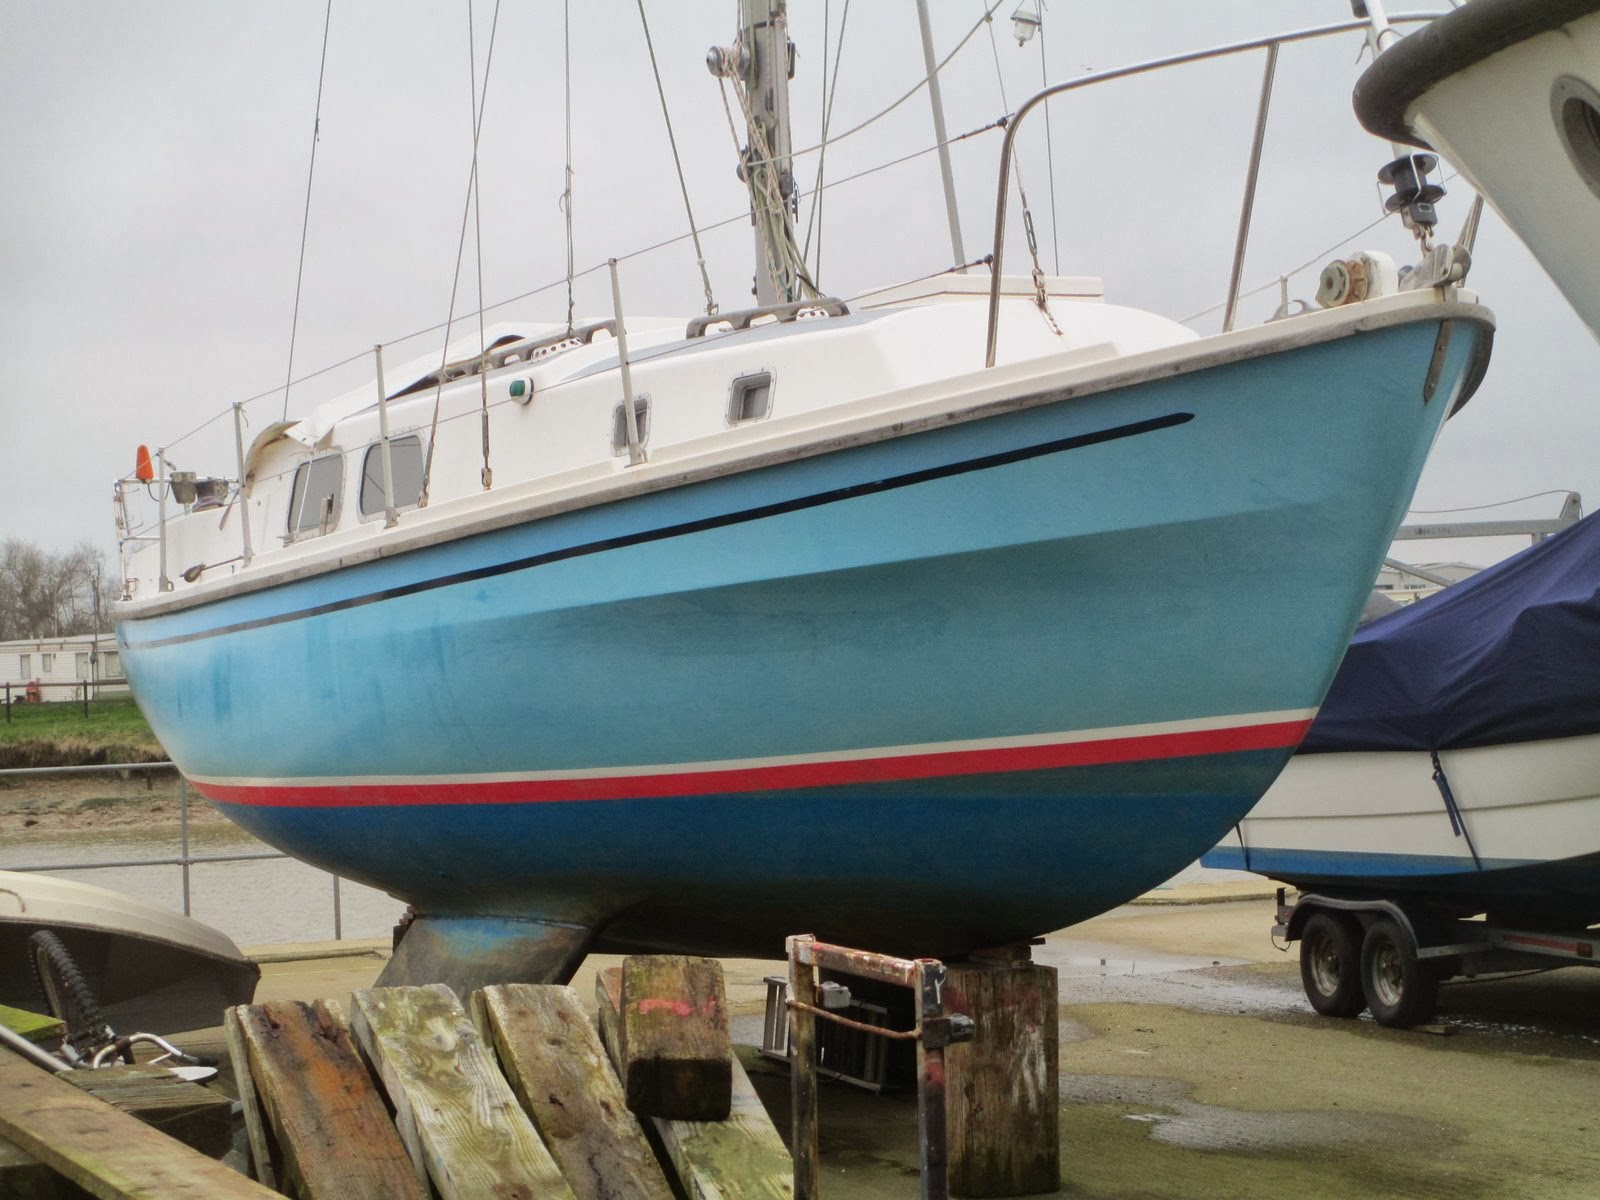 Yacht survey, Westerly Berwick in Littlehampton